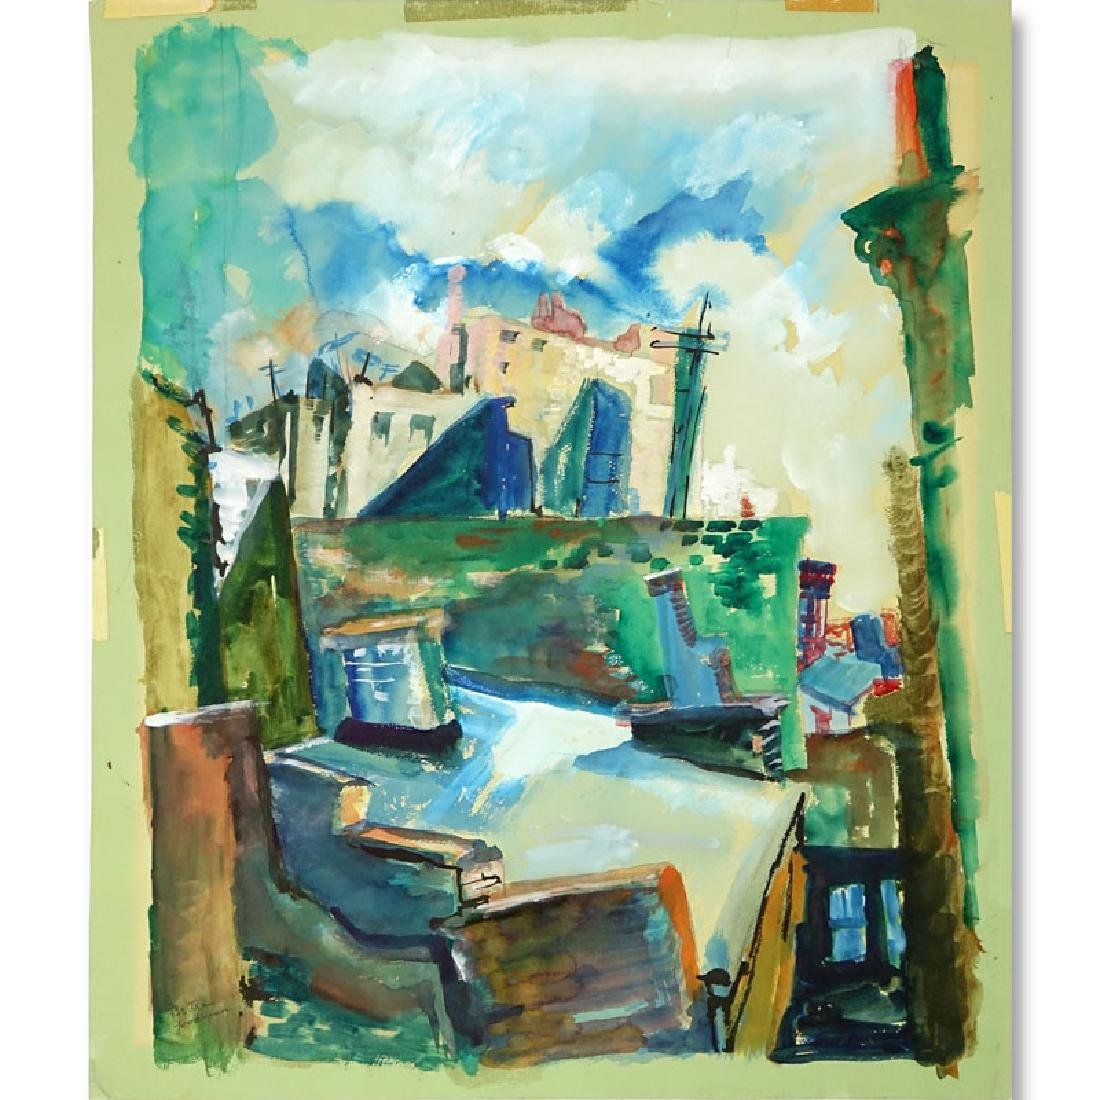 Bertram A Goodman, American (1904 - 1988) Watercolor on